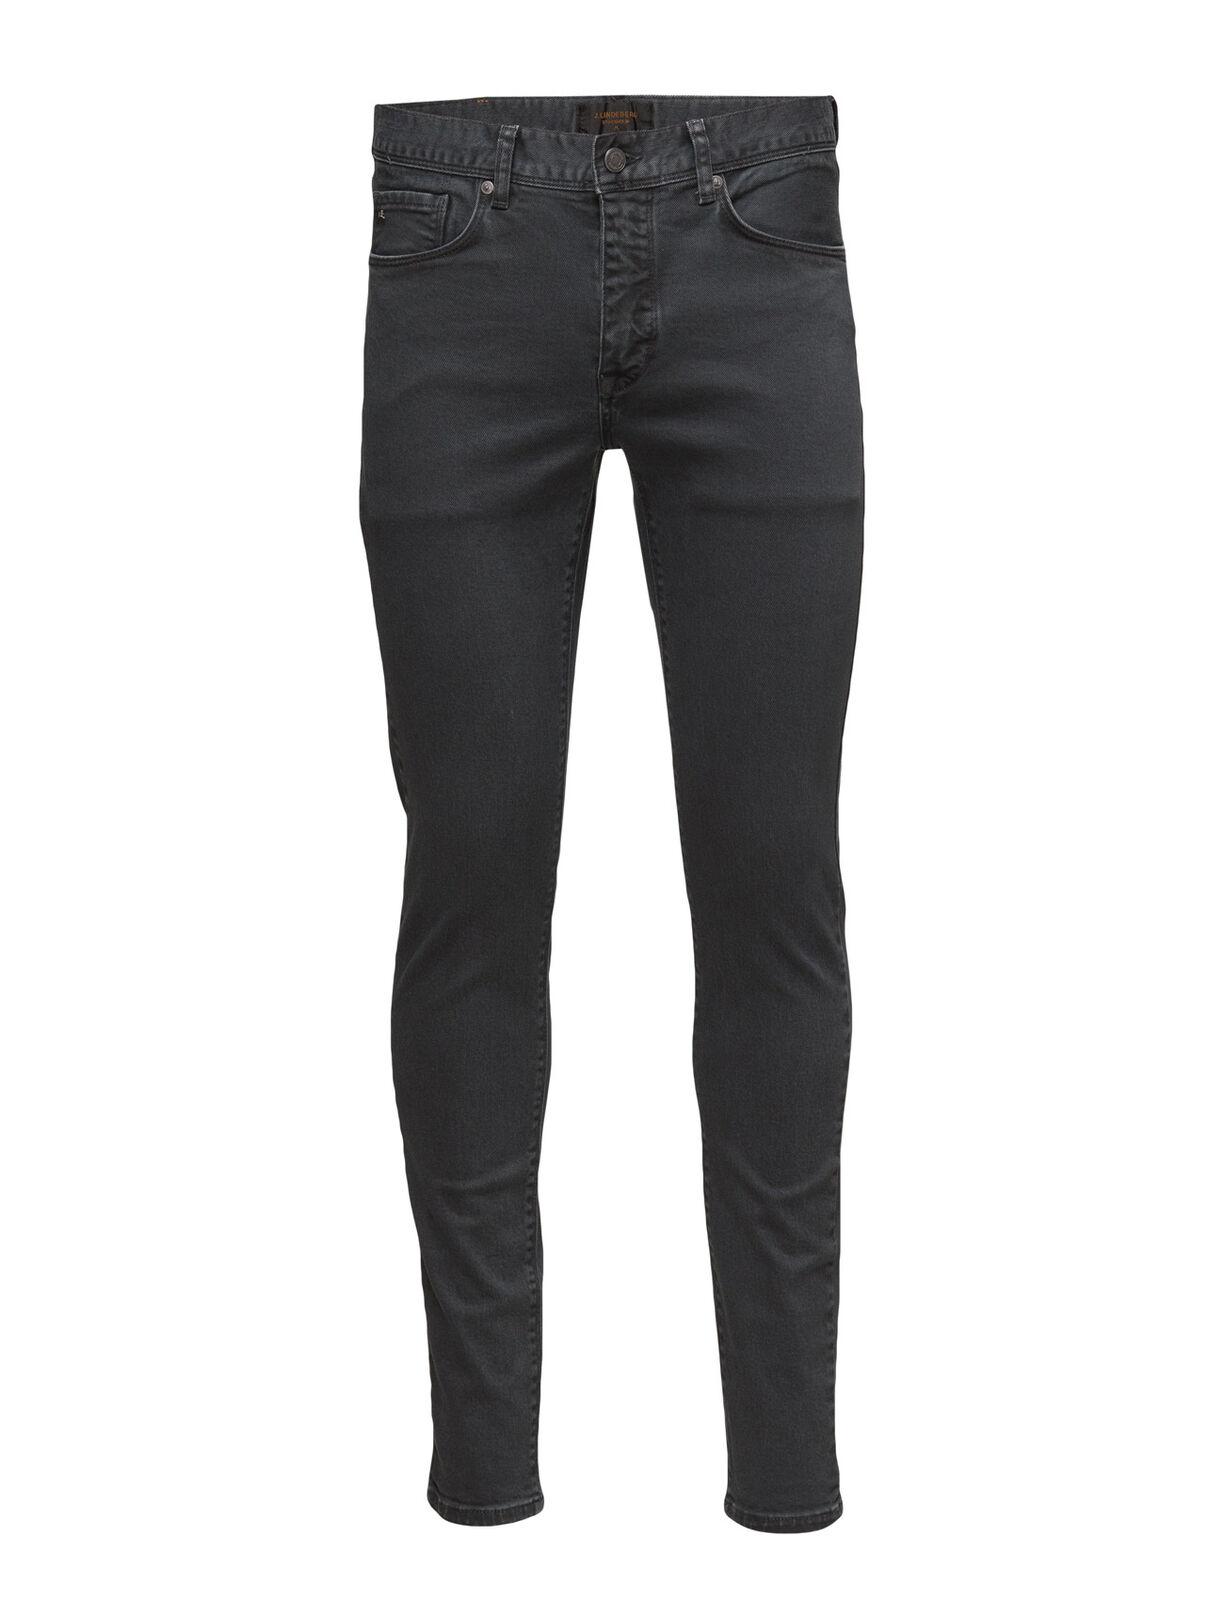 J. LINDEBERG Men's Rhino Grey Damien Crashed Jeans  NWT